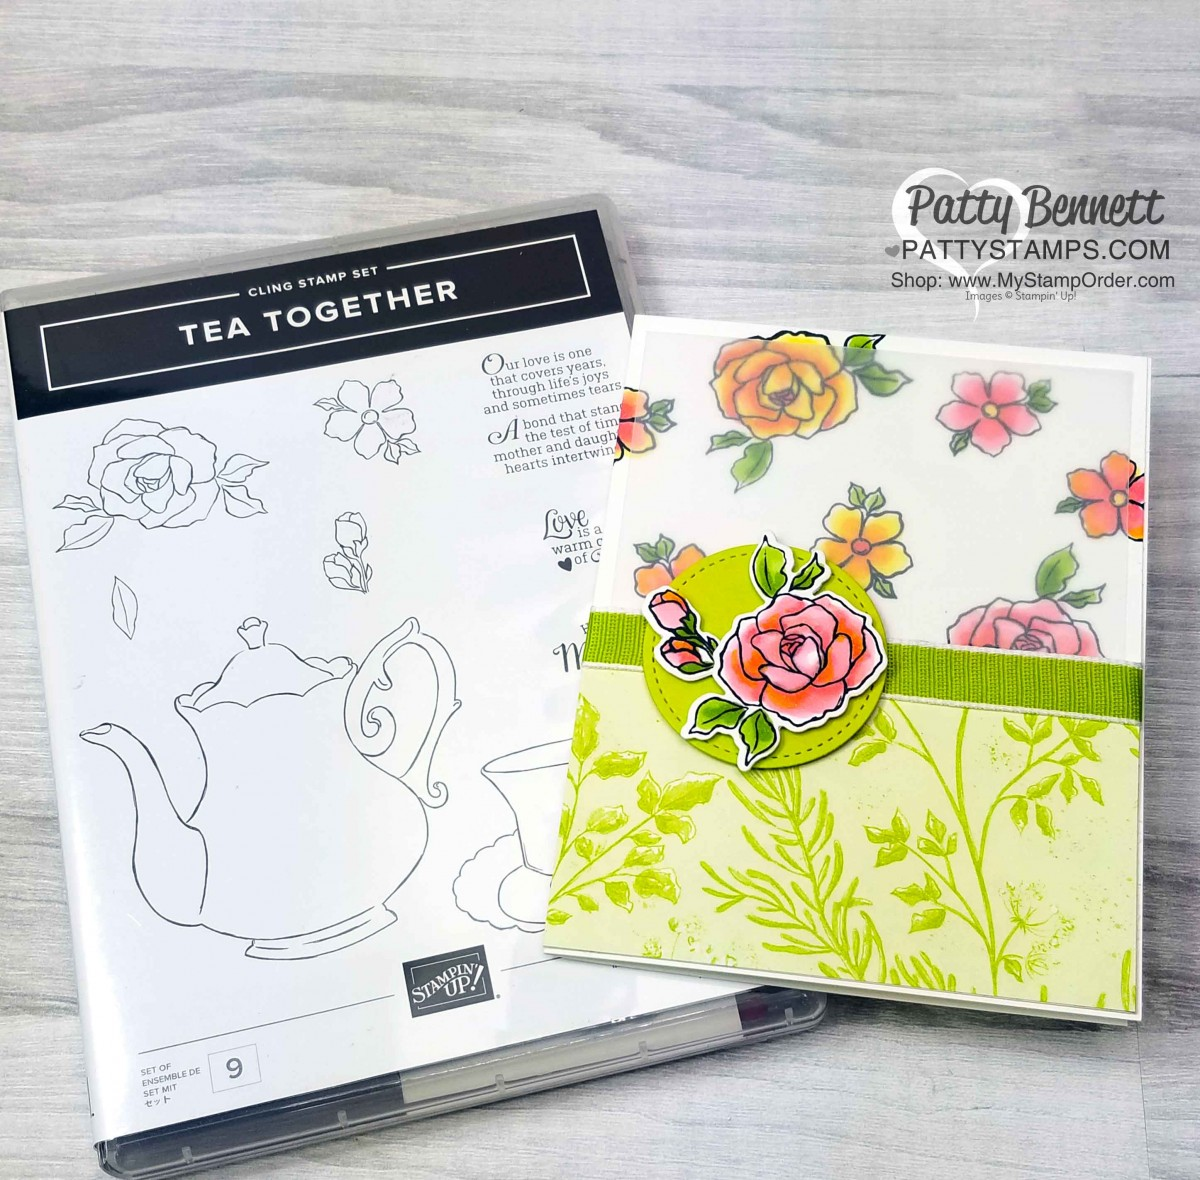 Tea Together Floral Card with Stampin' Blends